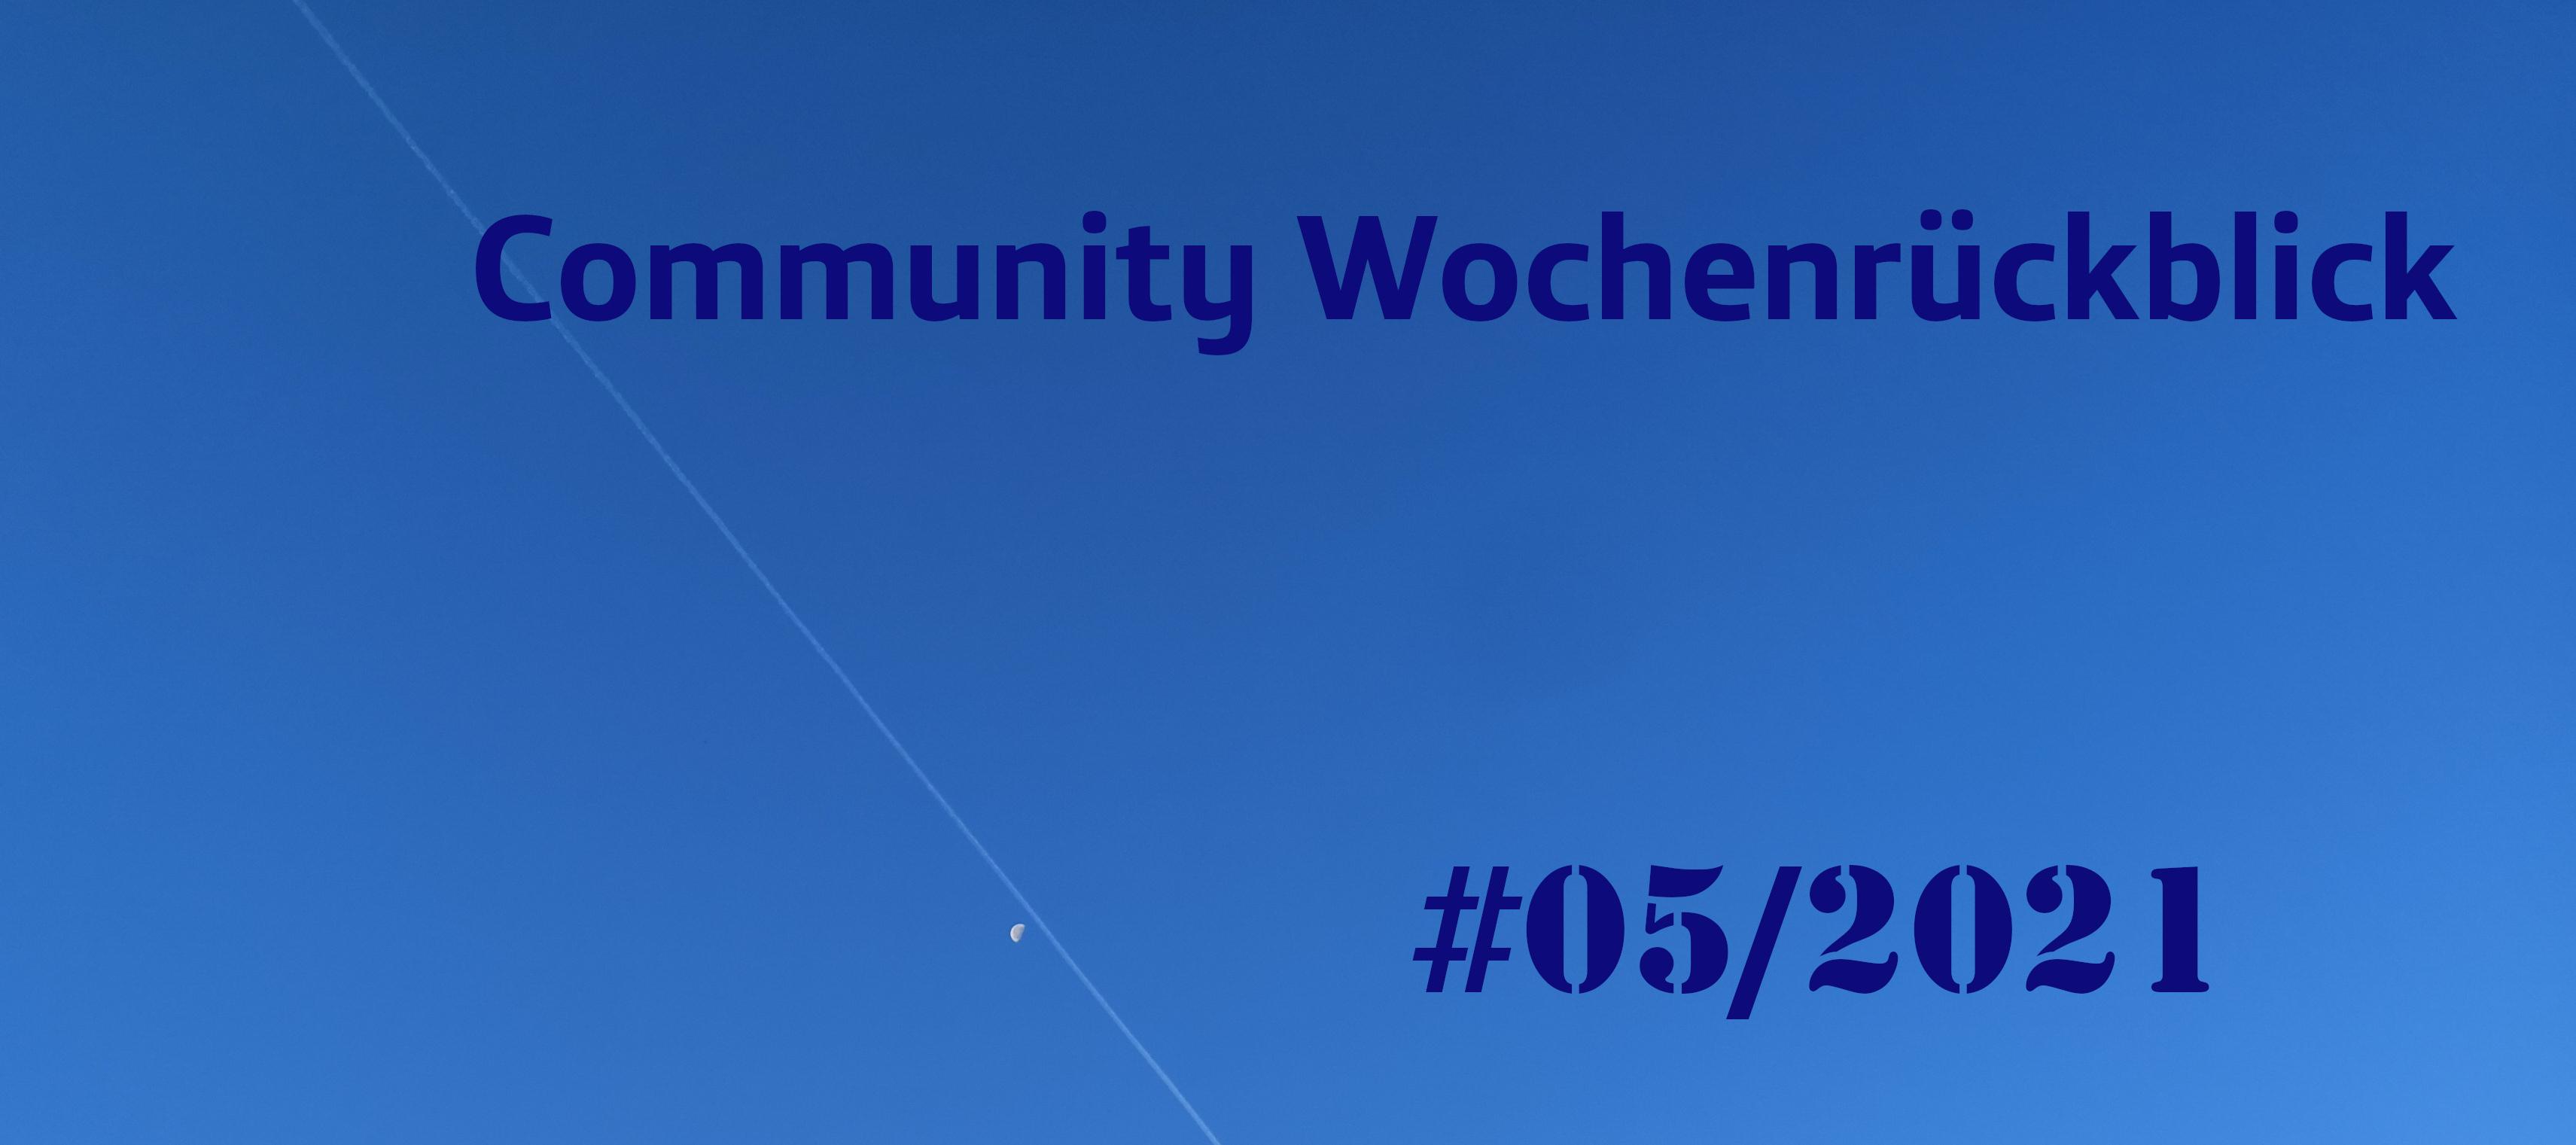 Community Wochenrückblick #05/2021